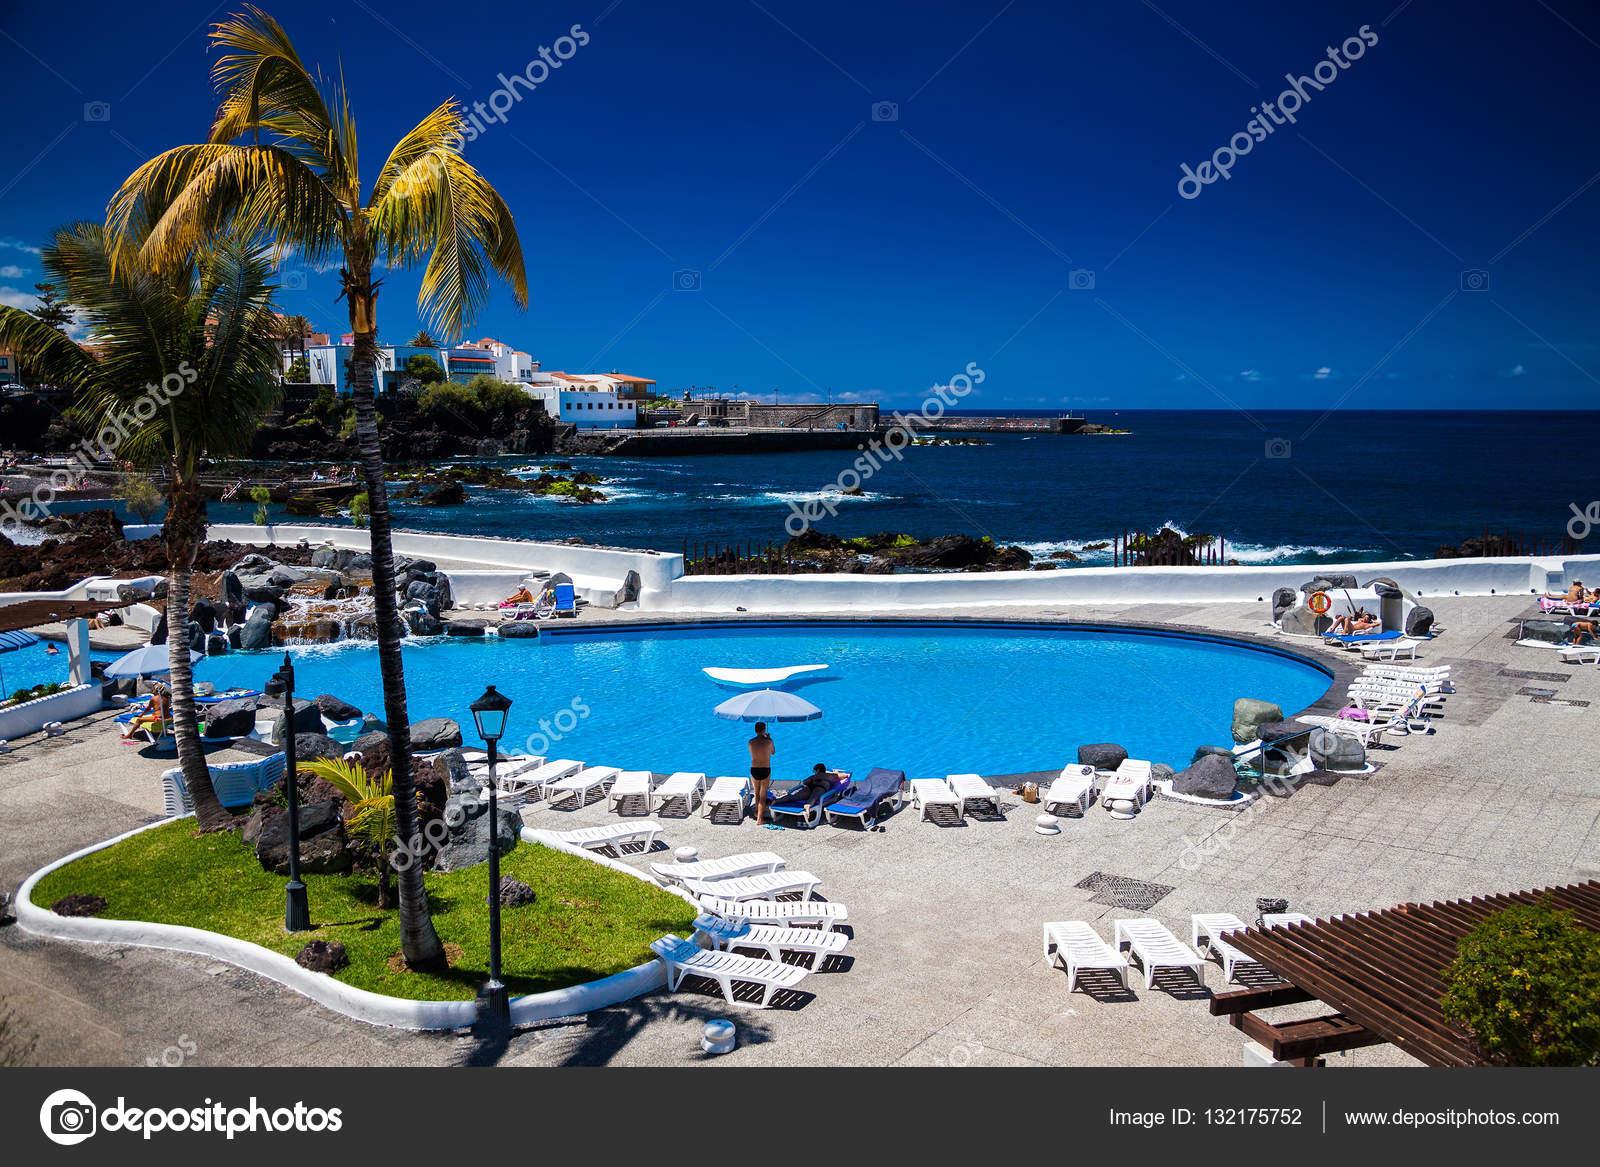 Complexo de piscinas lago martianez fotografias de stock for Piscinas martianez